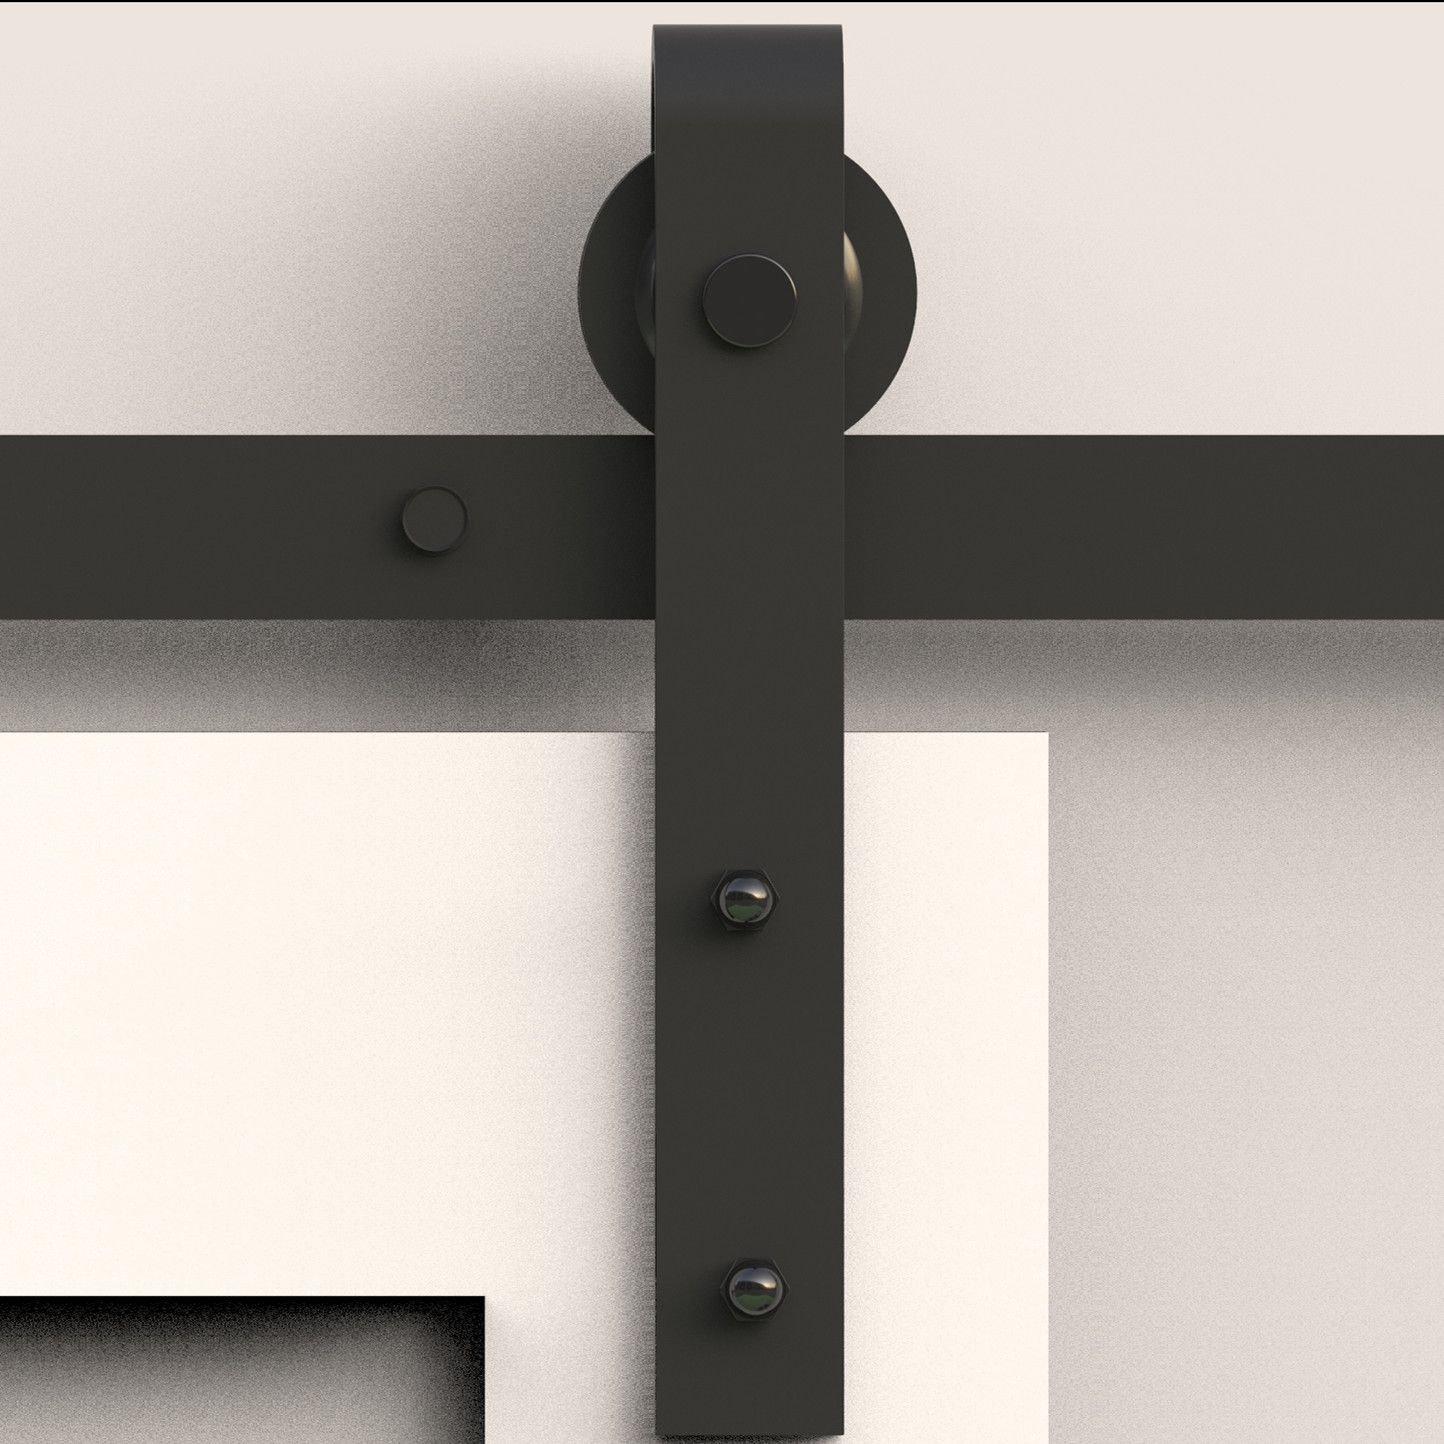 Fullhouse Rustic Black Single Sliding Barn Door Hardware Kit,7FT Track Bending Design - Industrial Strength Hangers, for Garage, Closet, Interior and Exterior Door Use Quiet and Smooth Sliding